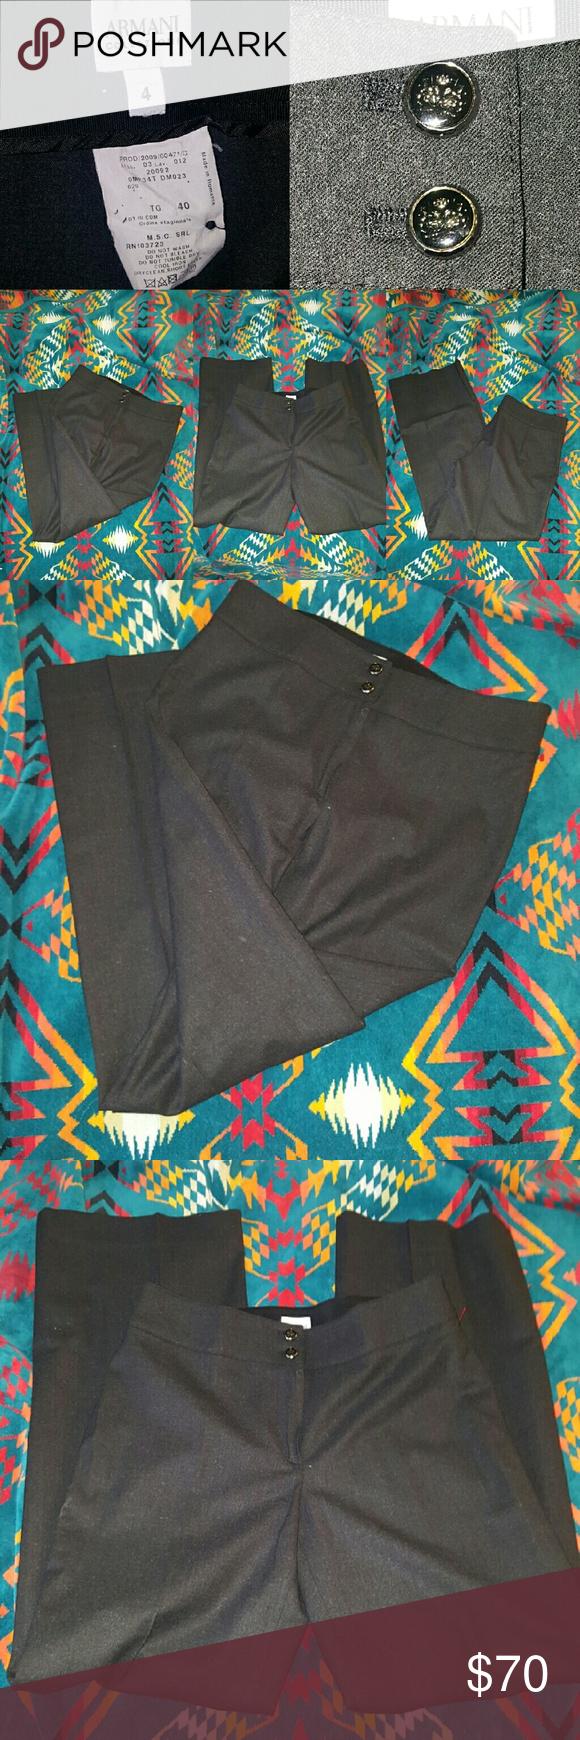 ARMANI COLLEZIONI PANTS 4 ITALY BLACK DRESS BEAUTIFUL ARMANI COLLEZIONI HIGH QUALITY LUXURY ORIGINAL PRICE $900 Armani Collezioni Pants Trousers